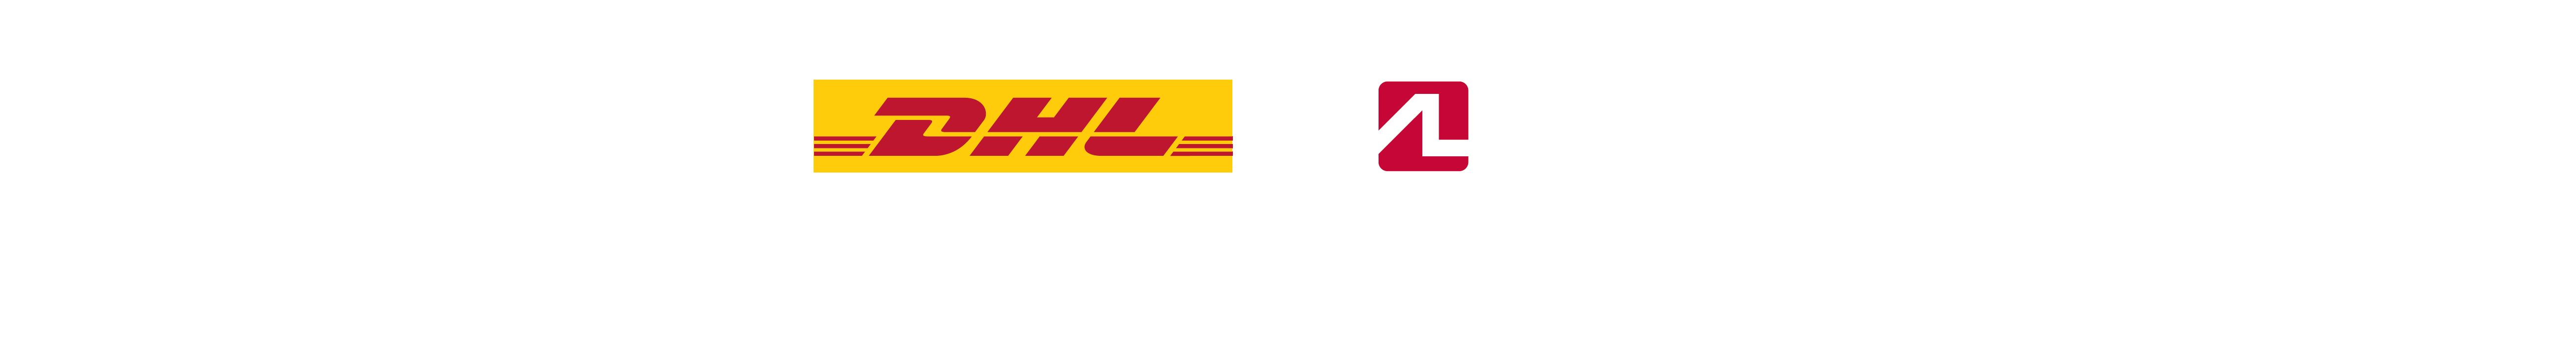 footer sponsors